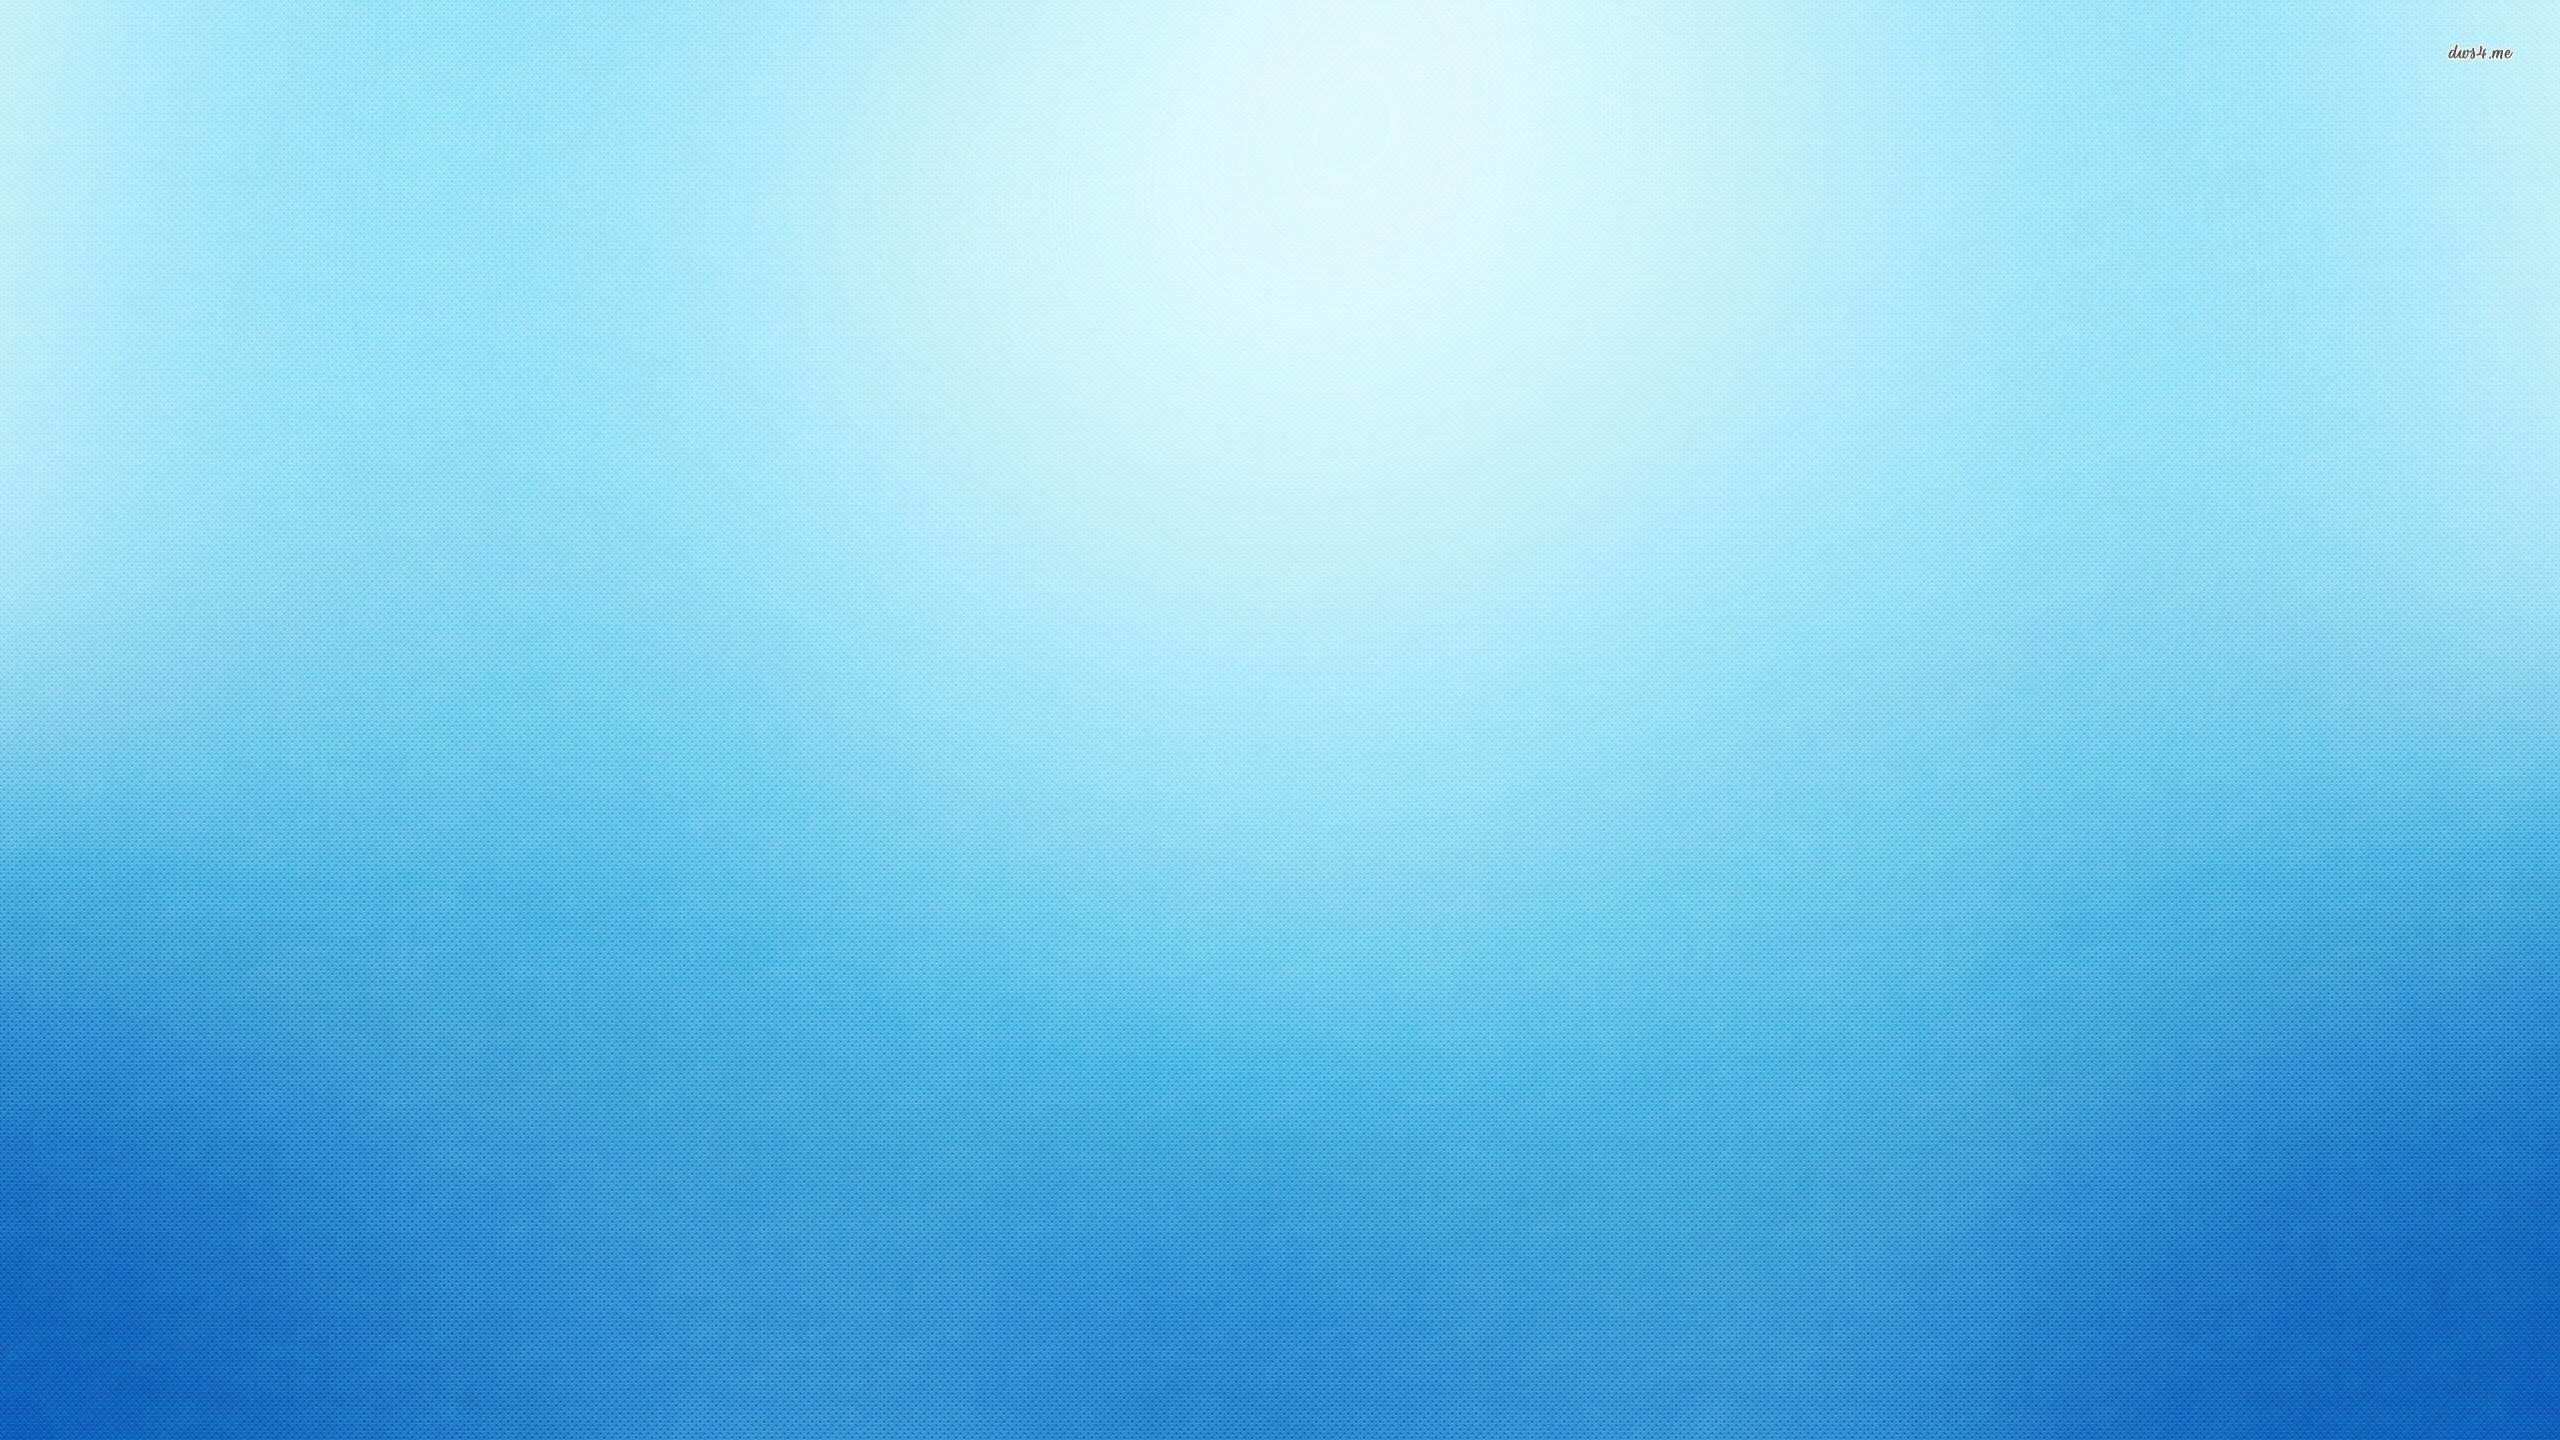 Light blue texture wallpaper – Abstract wallpapers – #